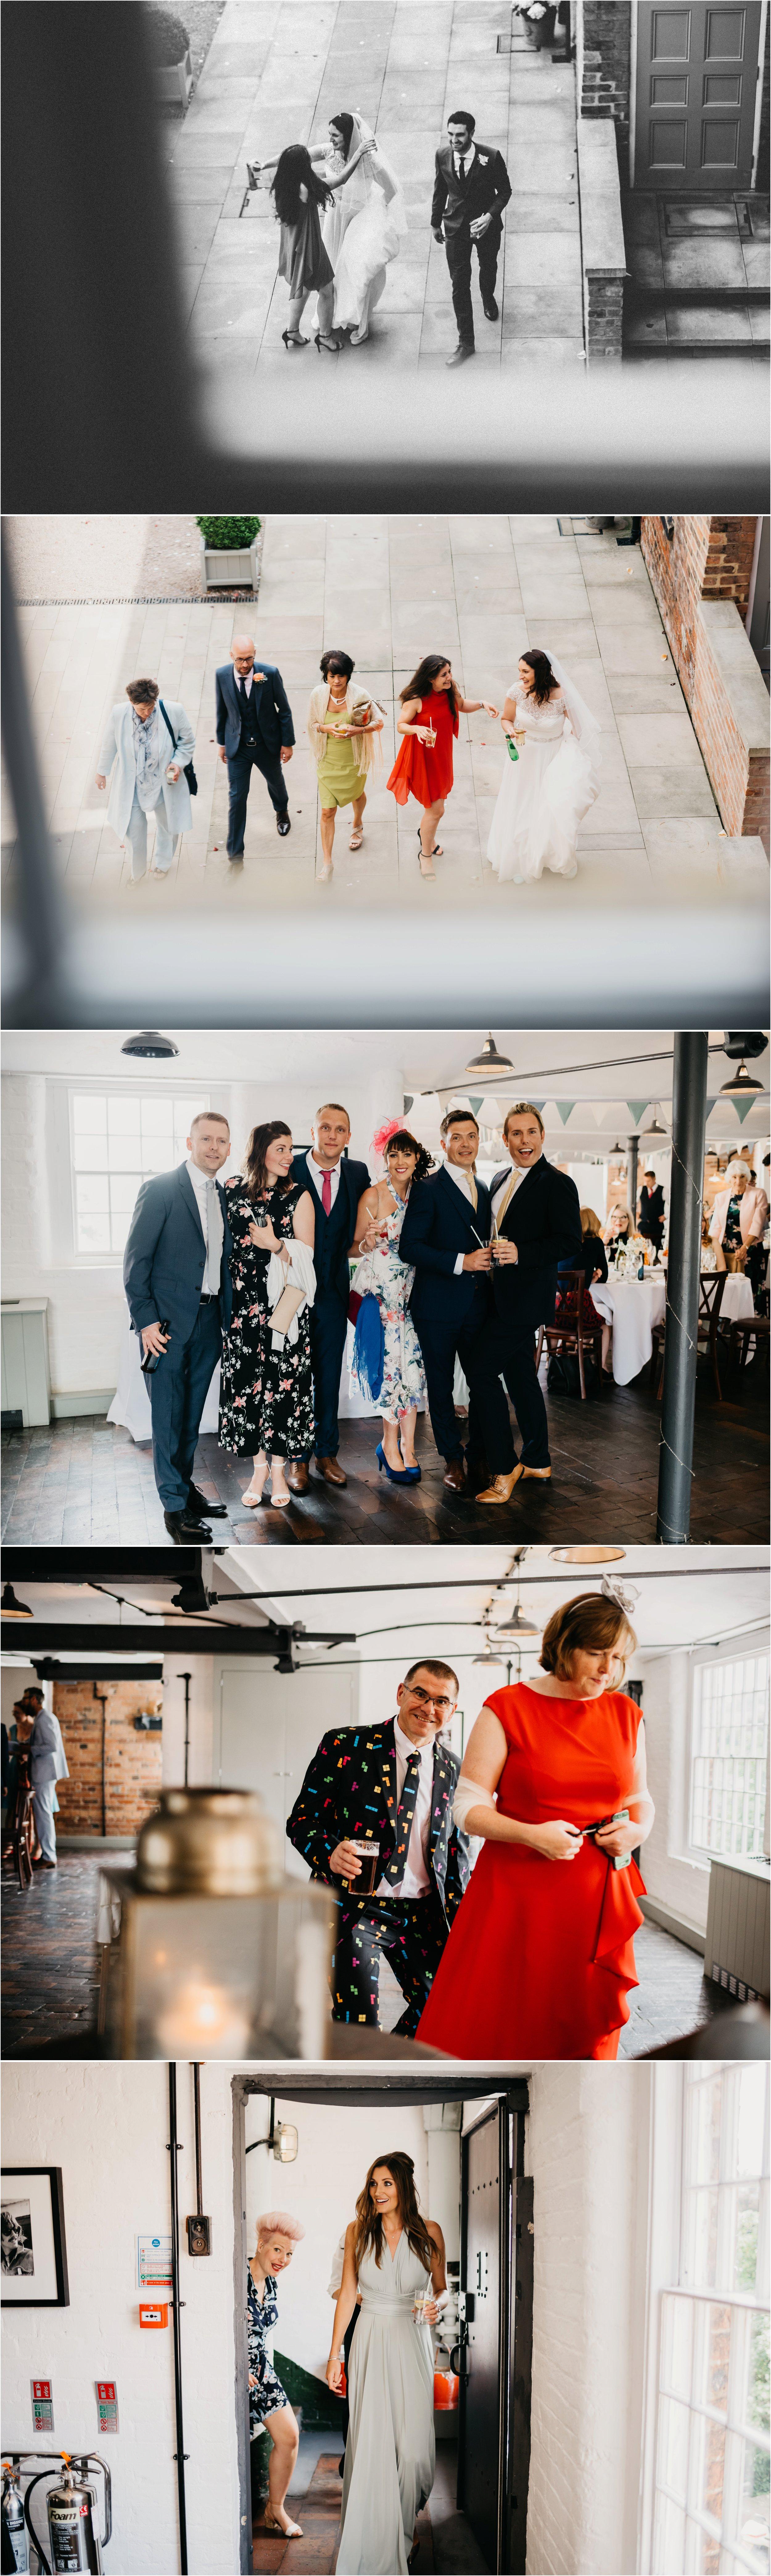 West Mill wedding photography_0057.jpg